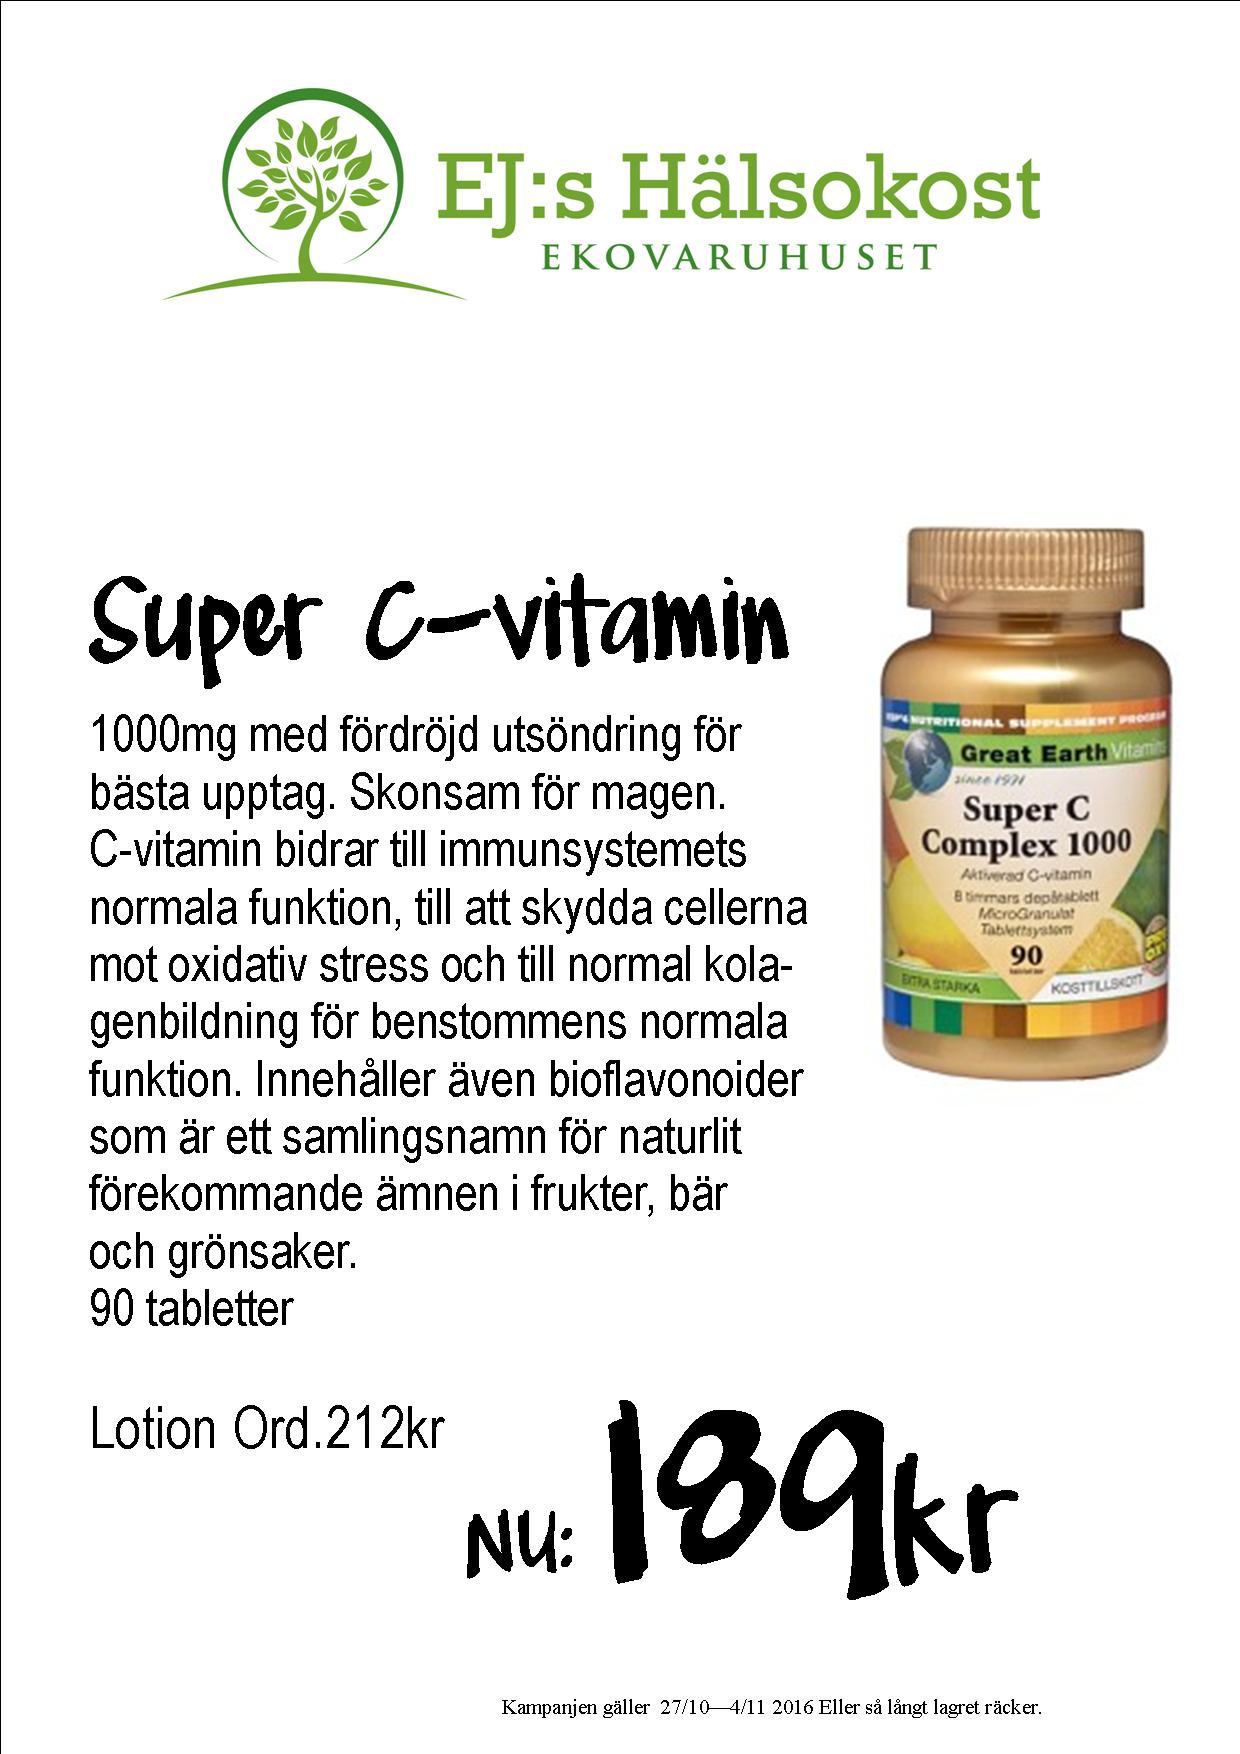 supercvitamin_stress_ejshalsokost_